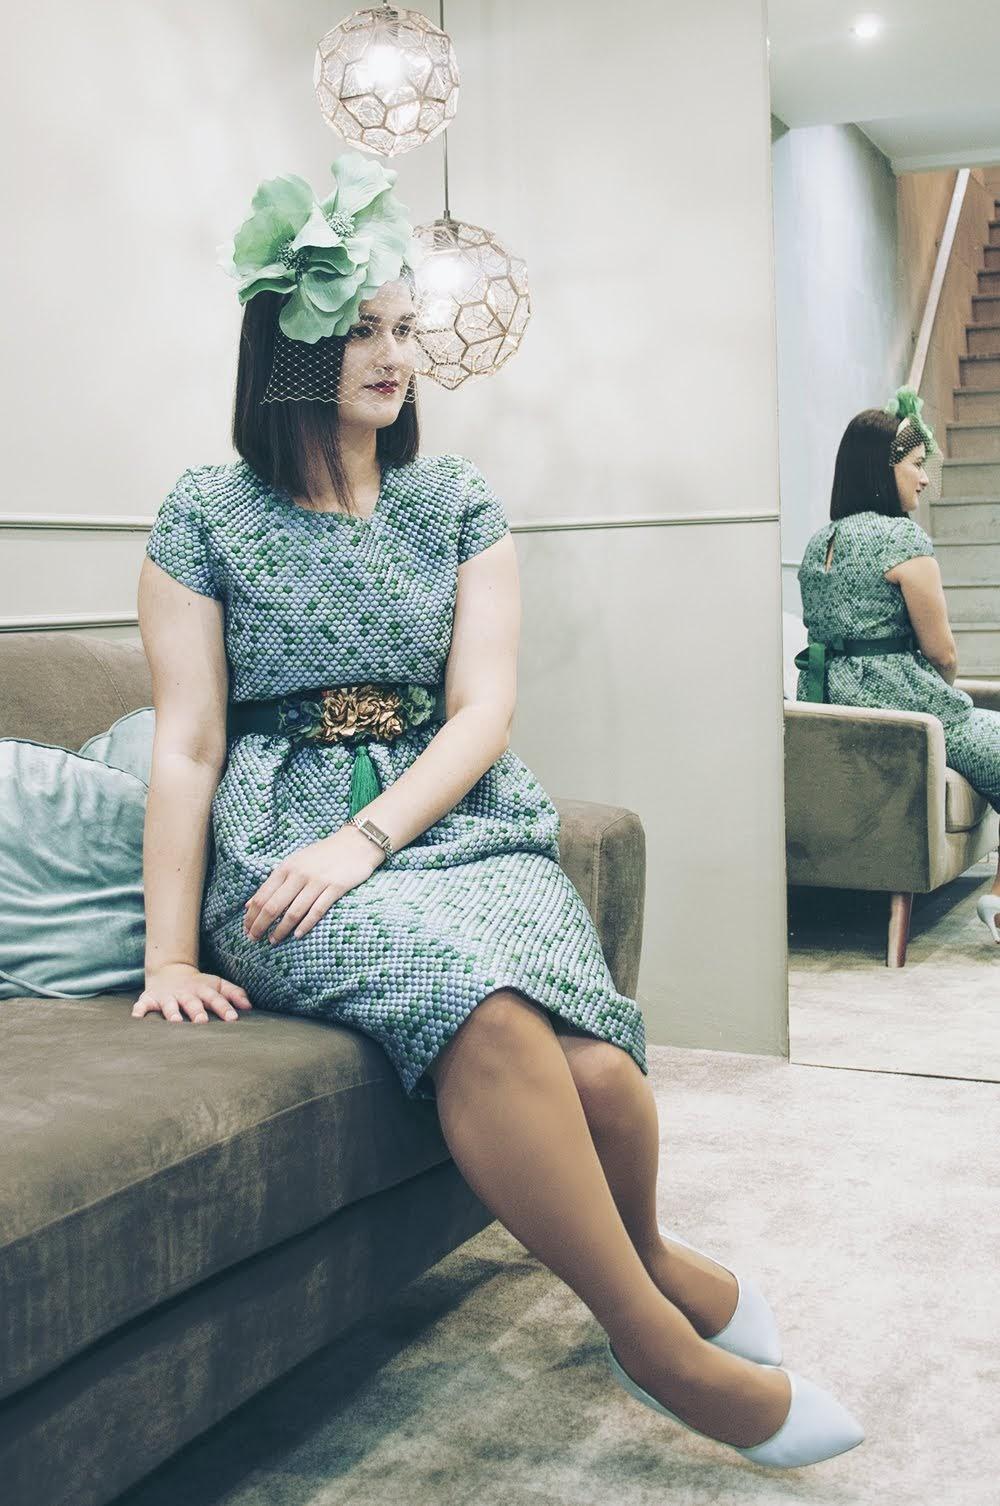 GloriaVelazquez españa bloggers influencers, Valenciabloggers, somethingfashion, amanda ramon, fiestayboda valencia, dressy events gowns style ideas, invitadaideal inspiration